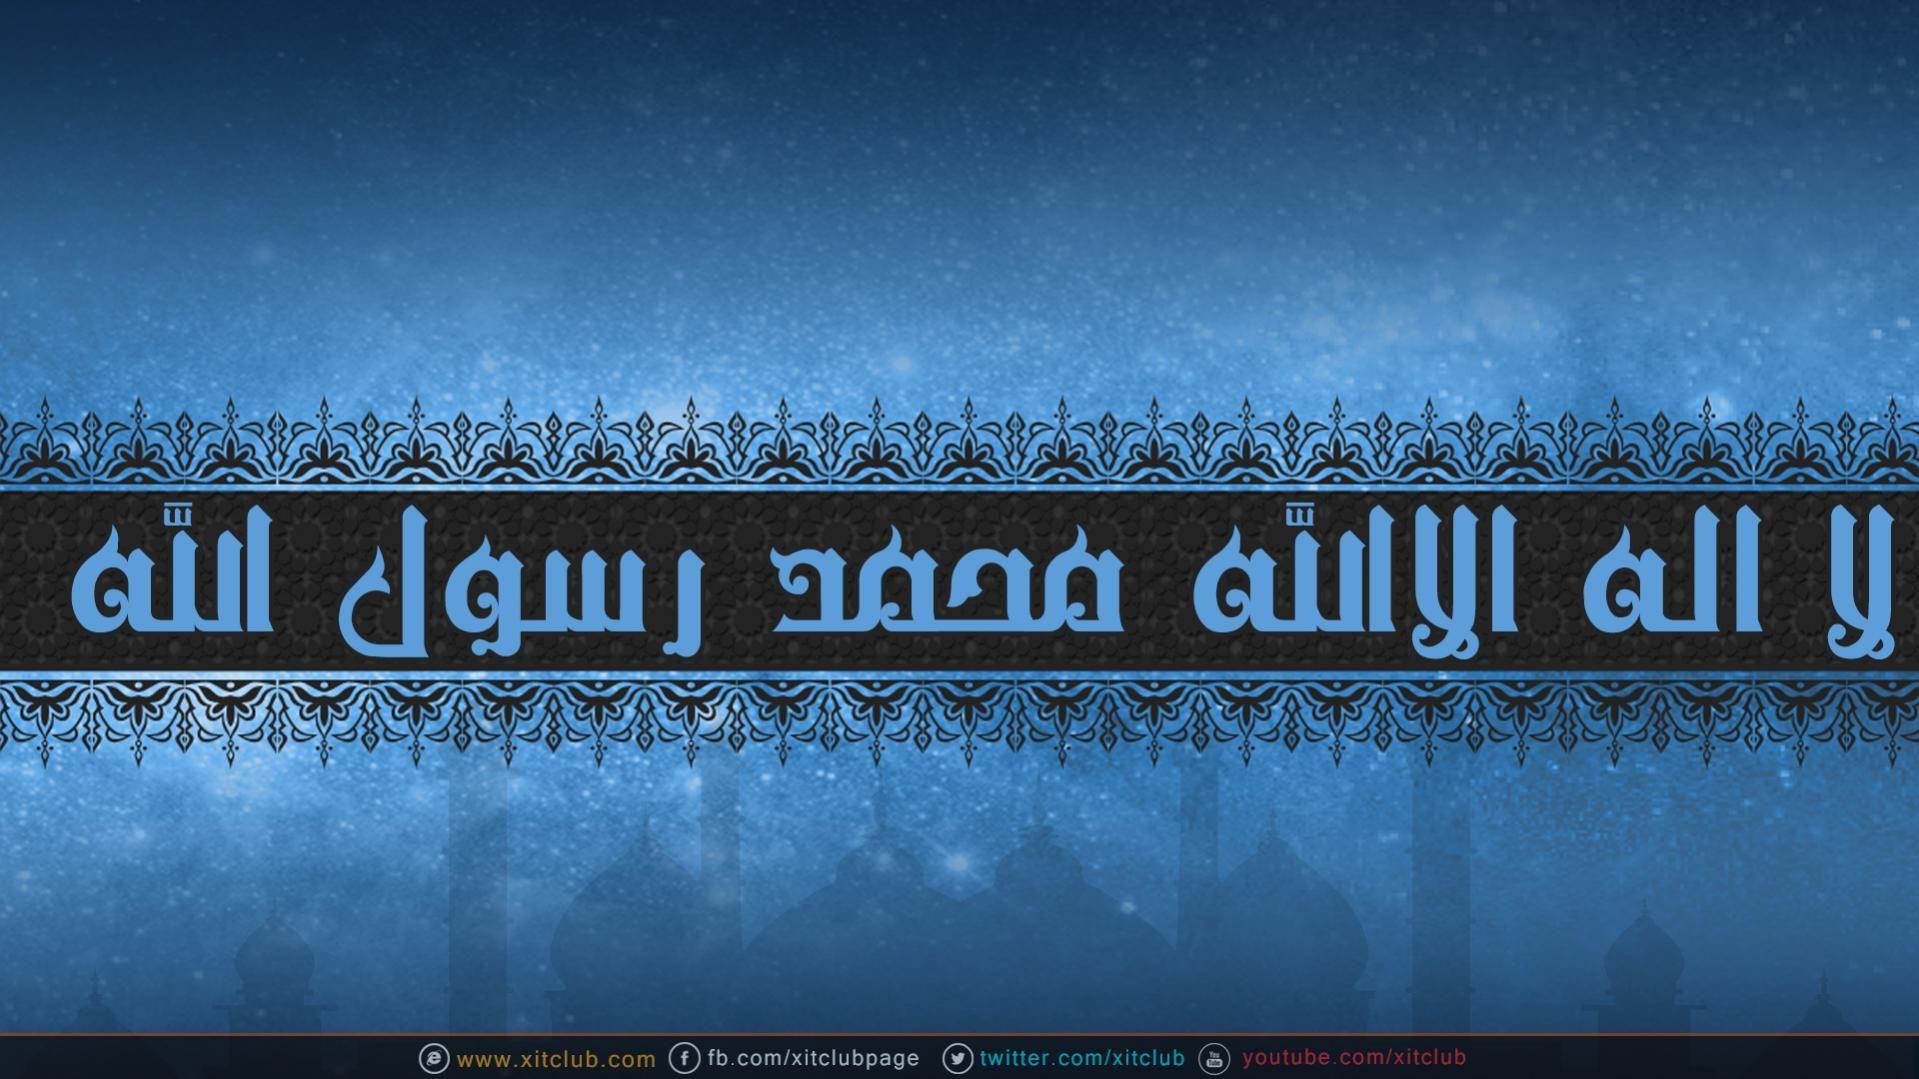 Islamic Hd Wallpapers 1280 840 Islamic Hd Wallpapers 41 Wallpapers